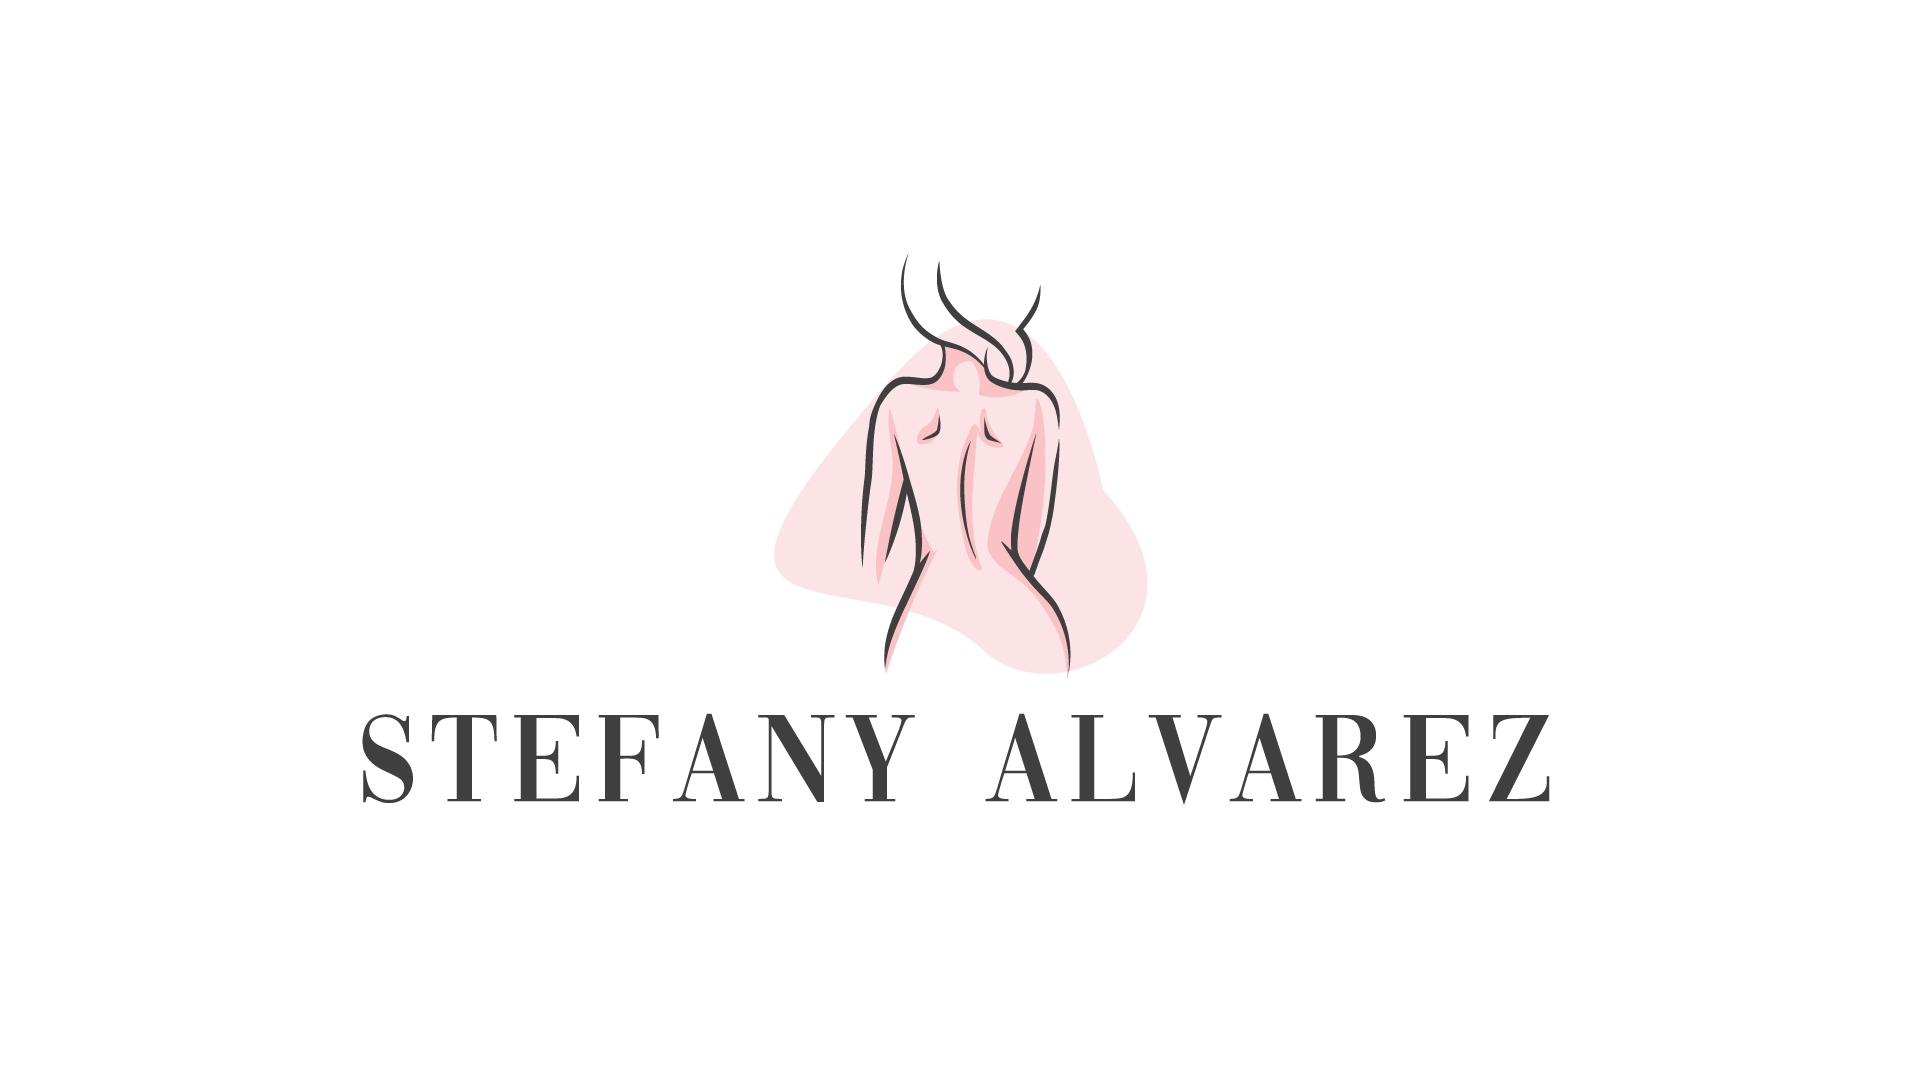 Stefany Alvarez